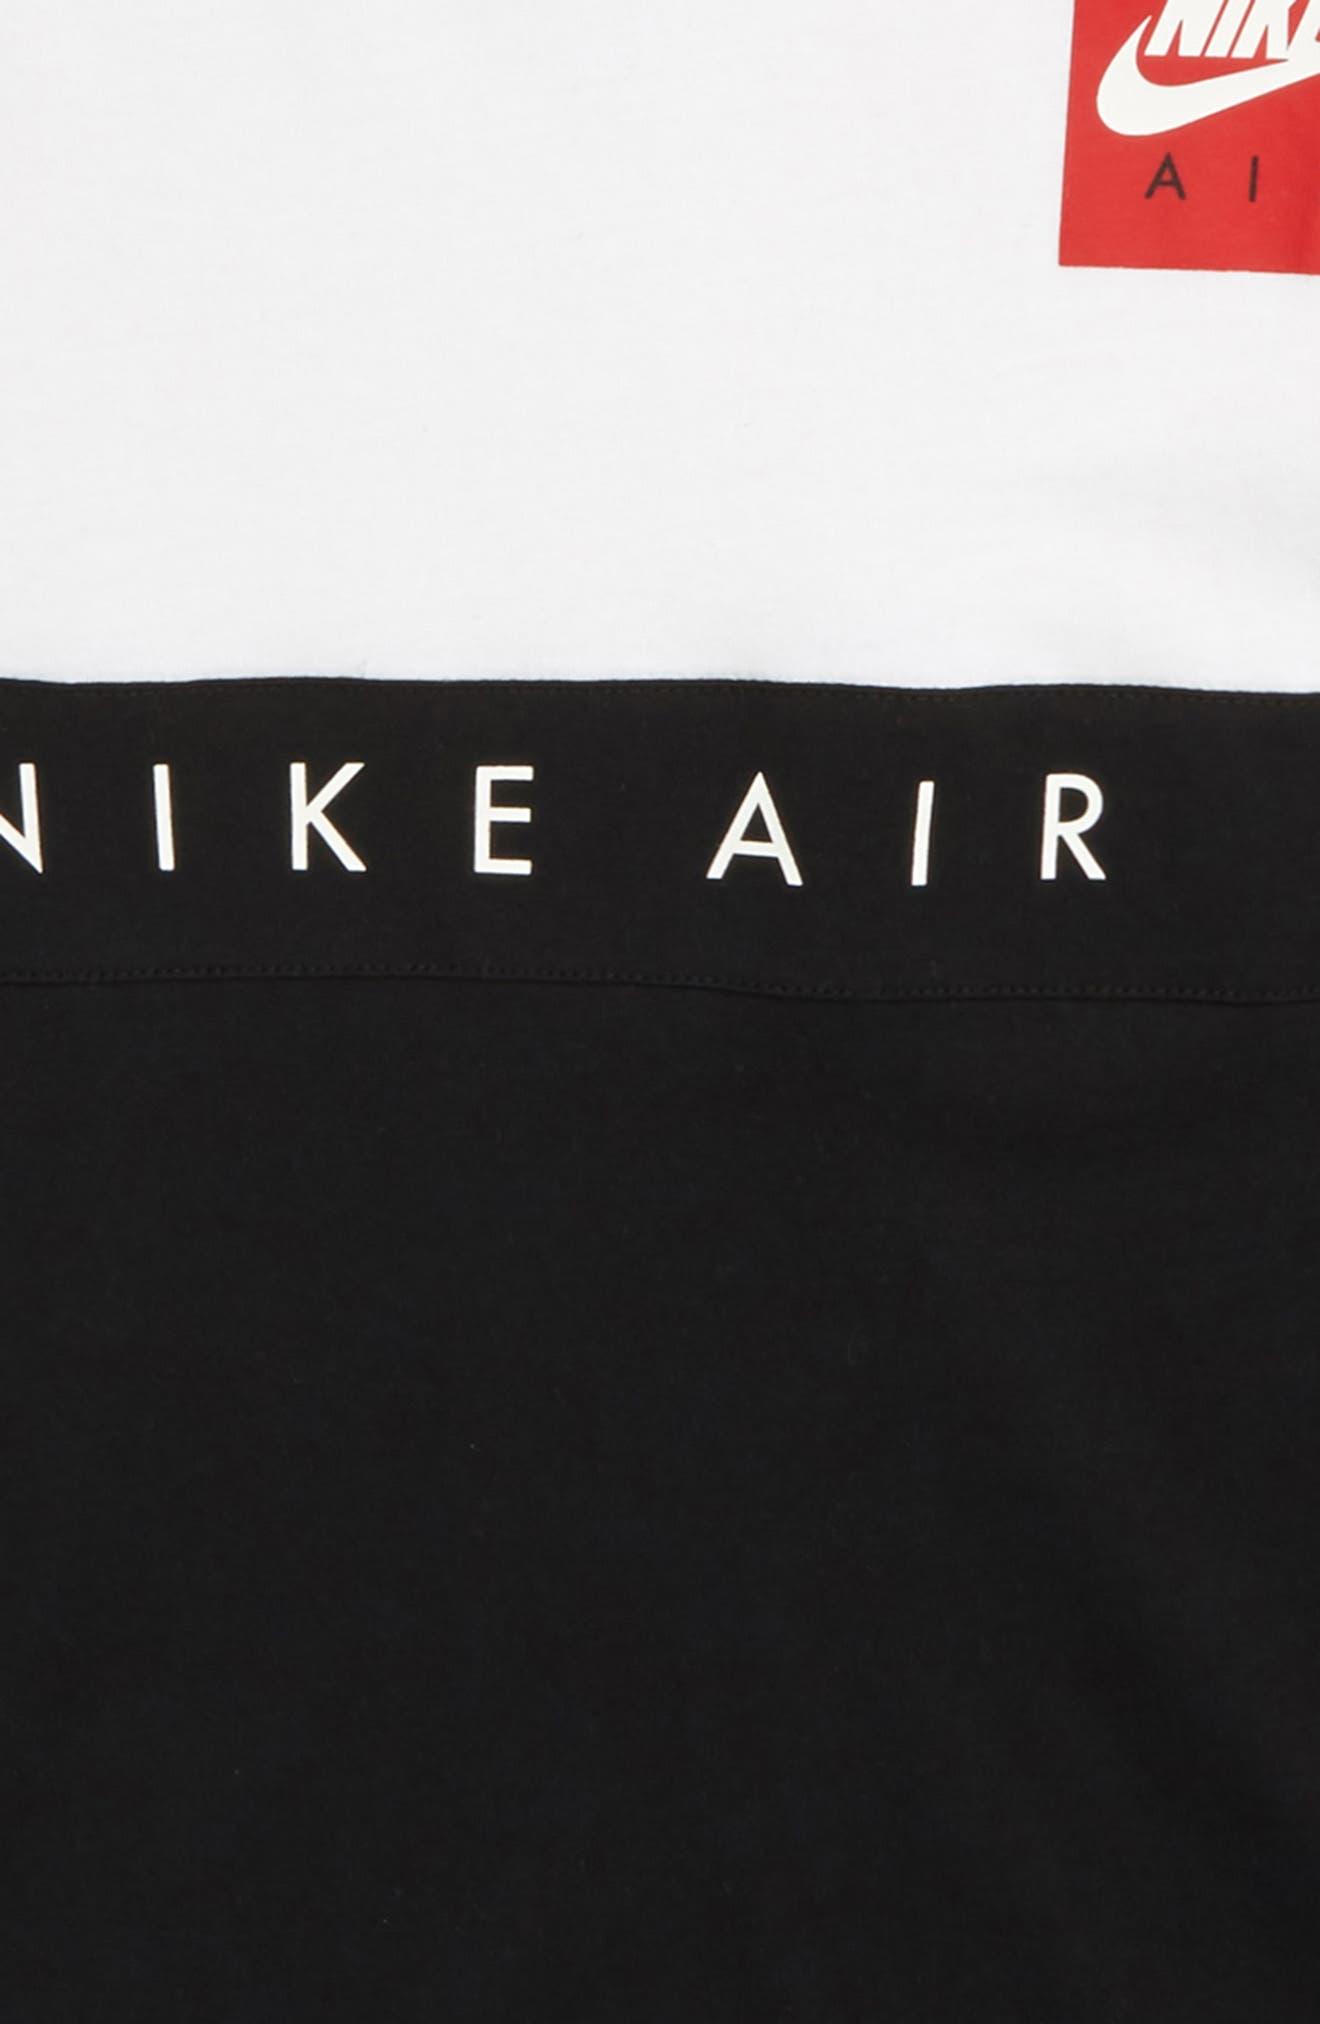 Air Shirt,                             Alternate thumbnail 2, color,                             White/ Black